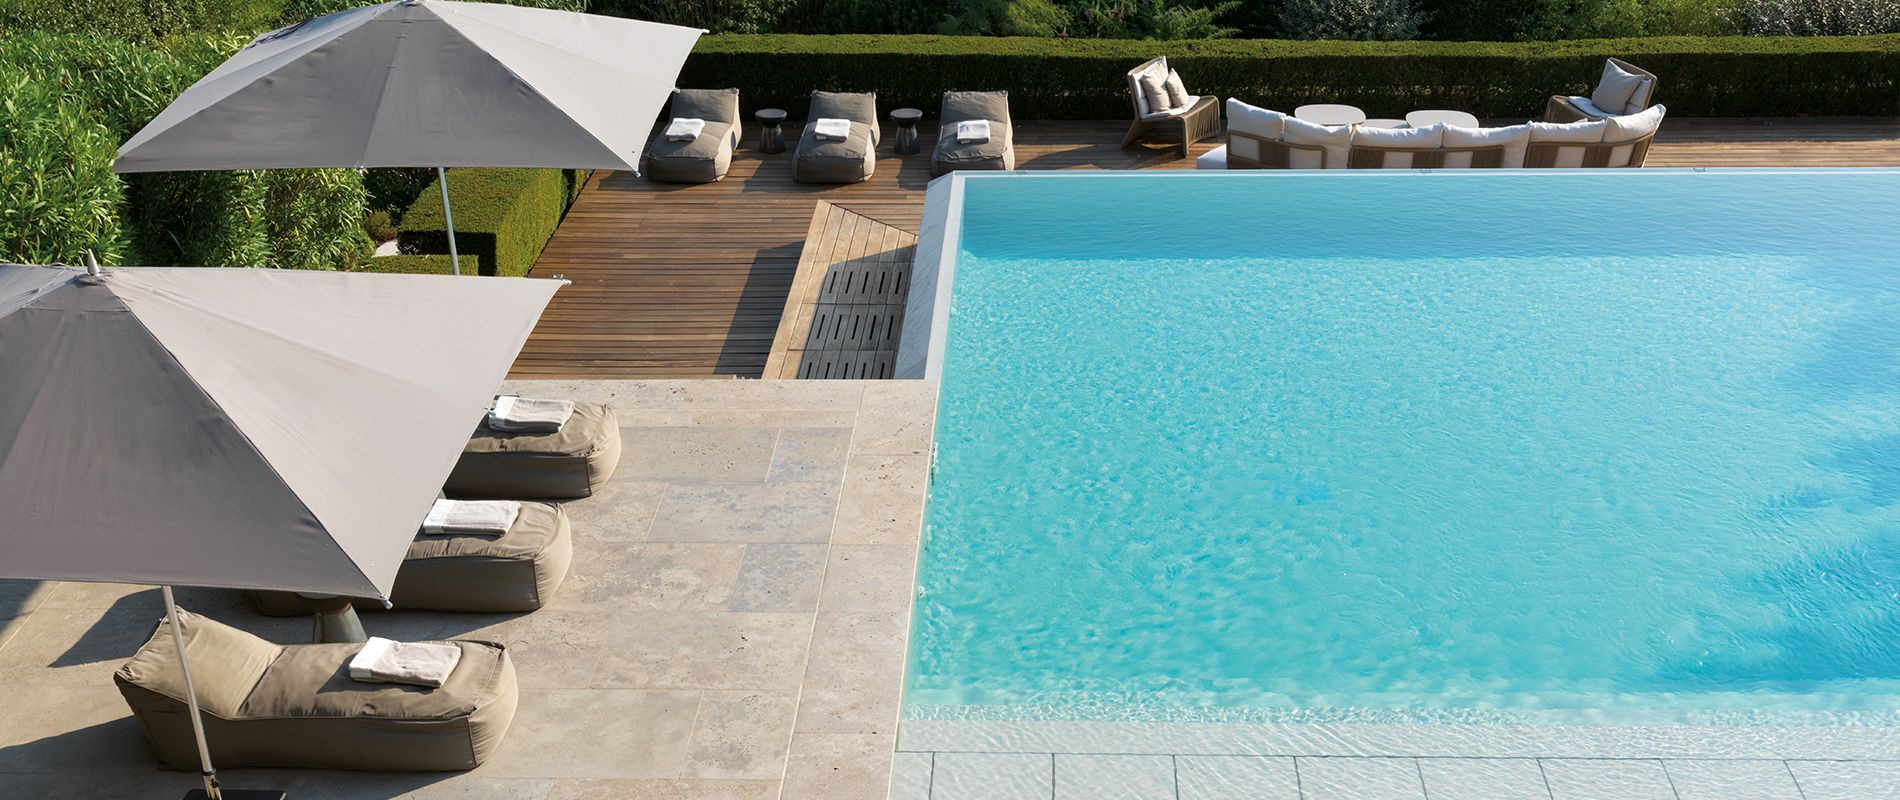 piscine-saint-tropez-organiser-seminaire-entreprise